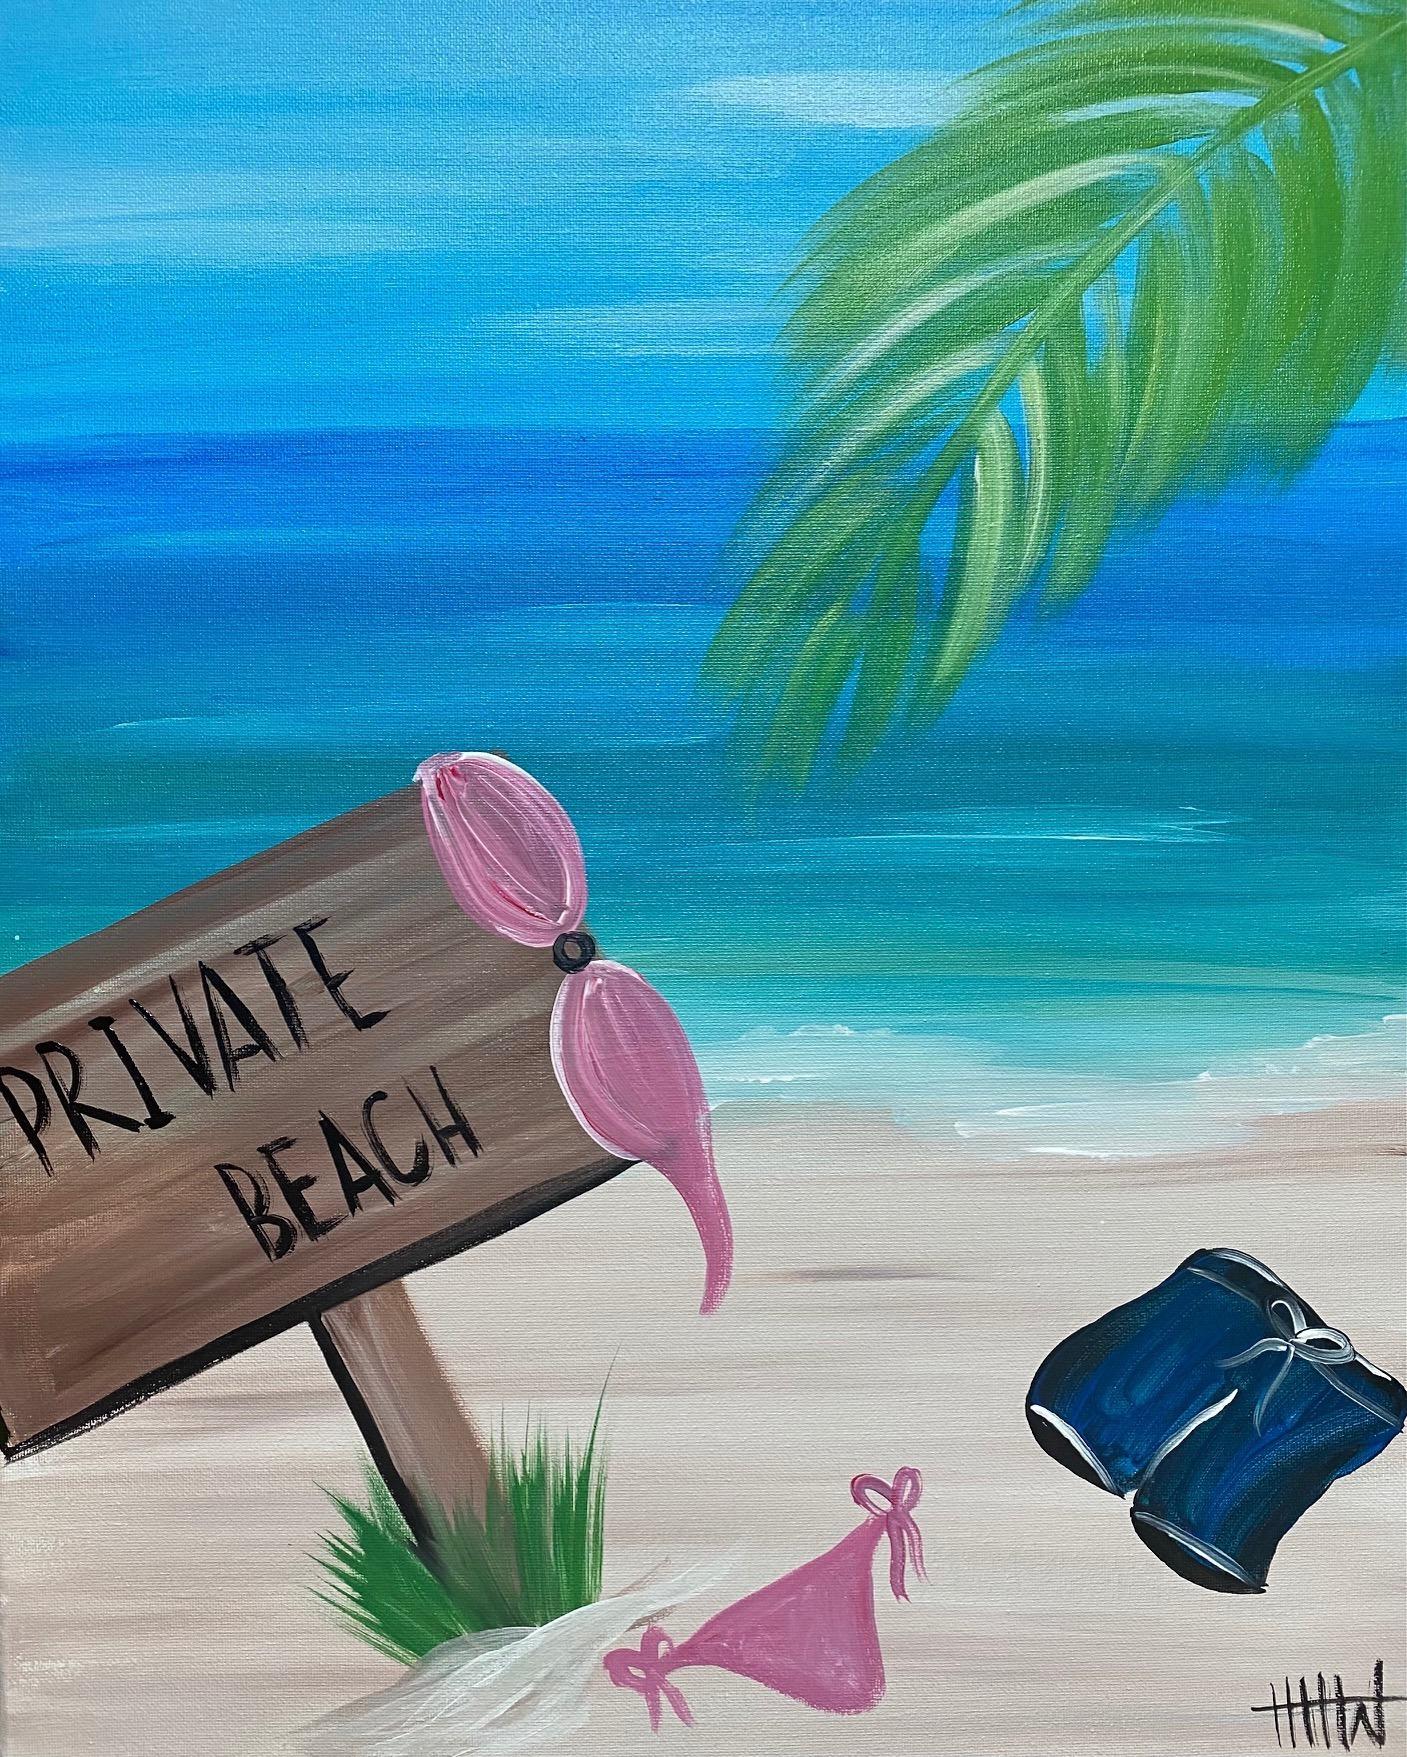 Brush Strokes & Buzzed Folks: Private Beach